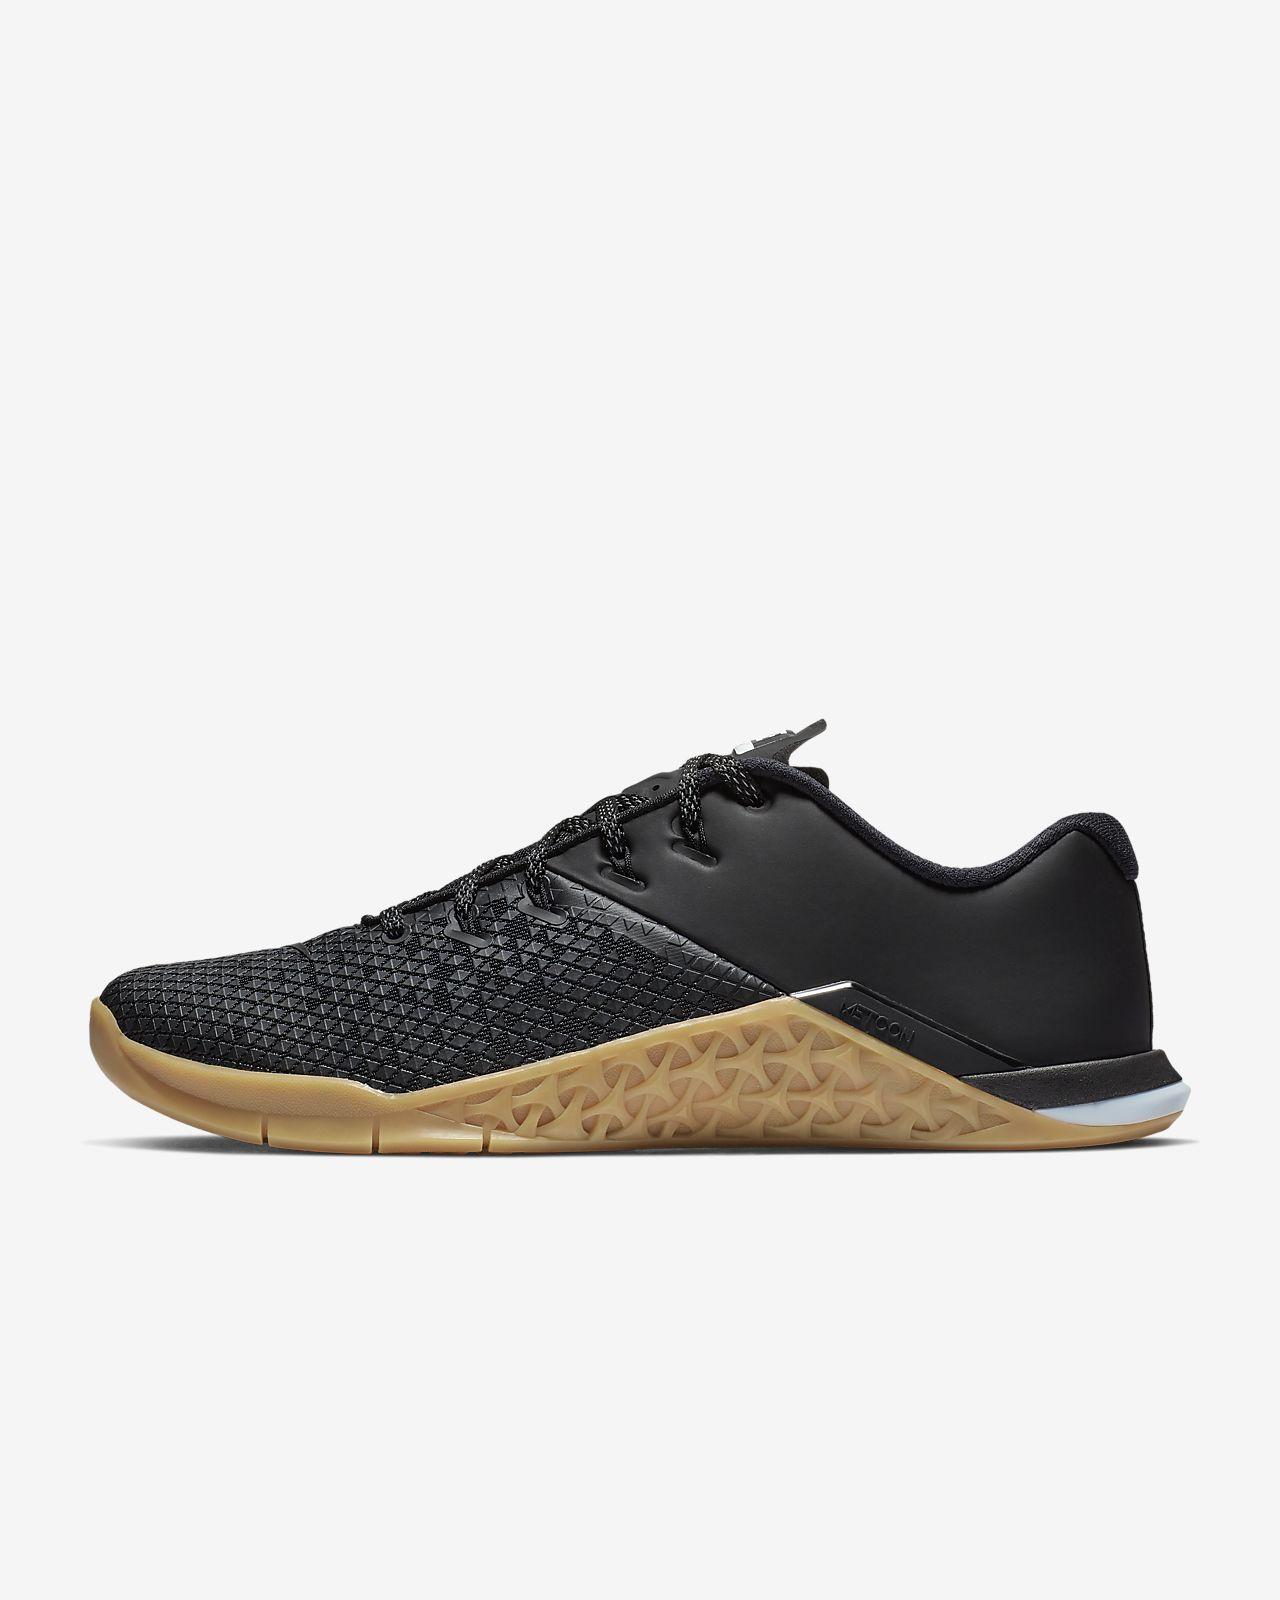 Nike Metcon 4 XD X Chalkboard 男款交叉訓練/重量訓練鞋